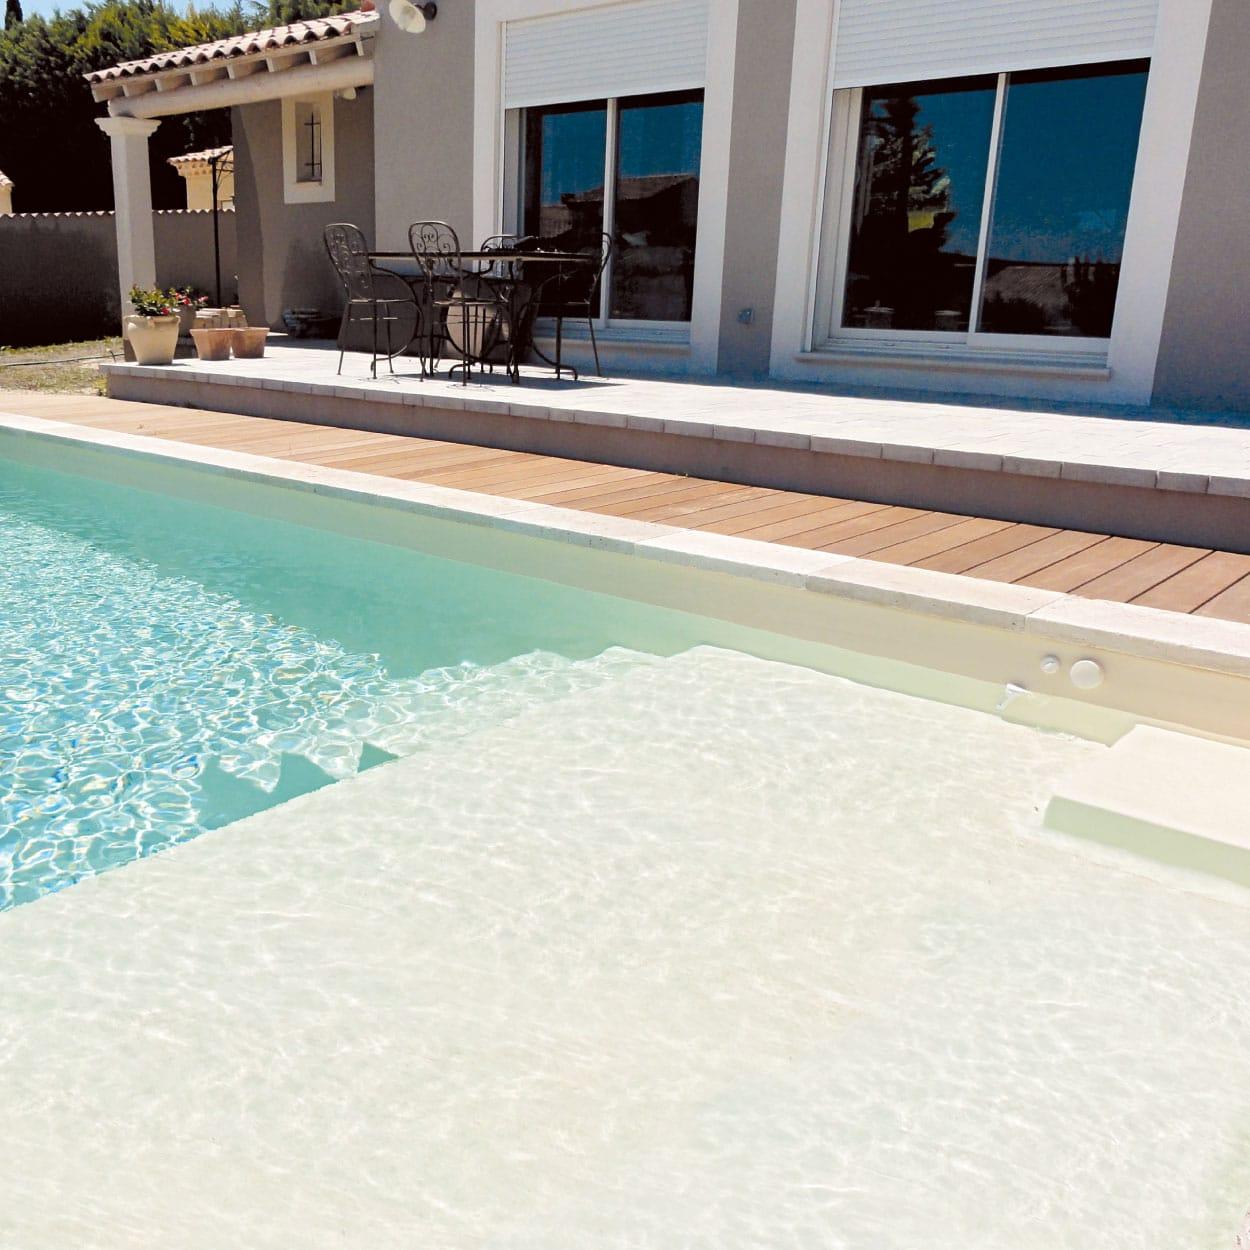 realisation-piscine-coque-prado-plage Modèle Prado Plage